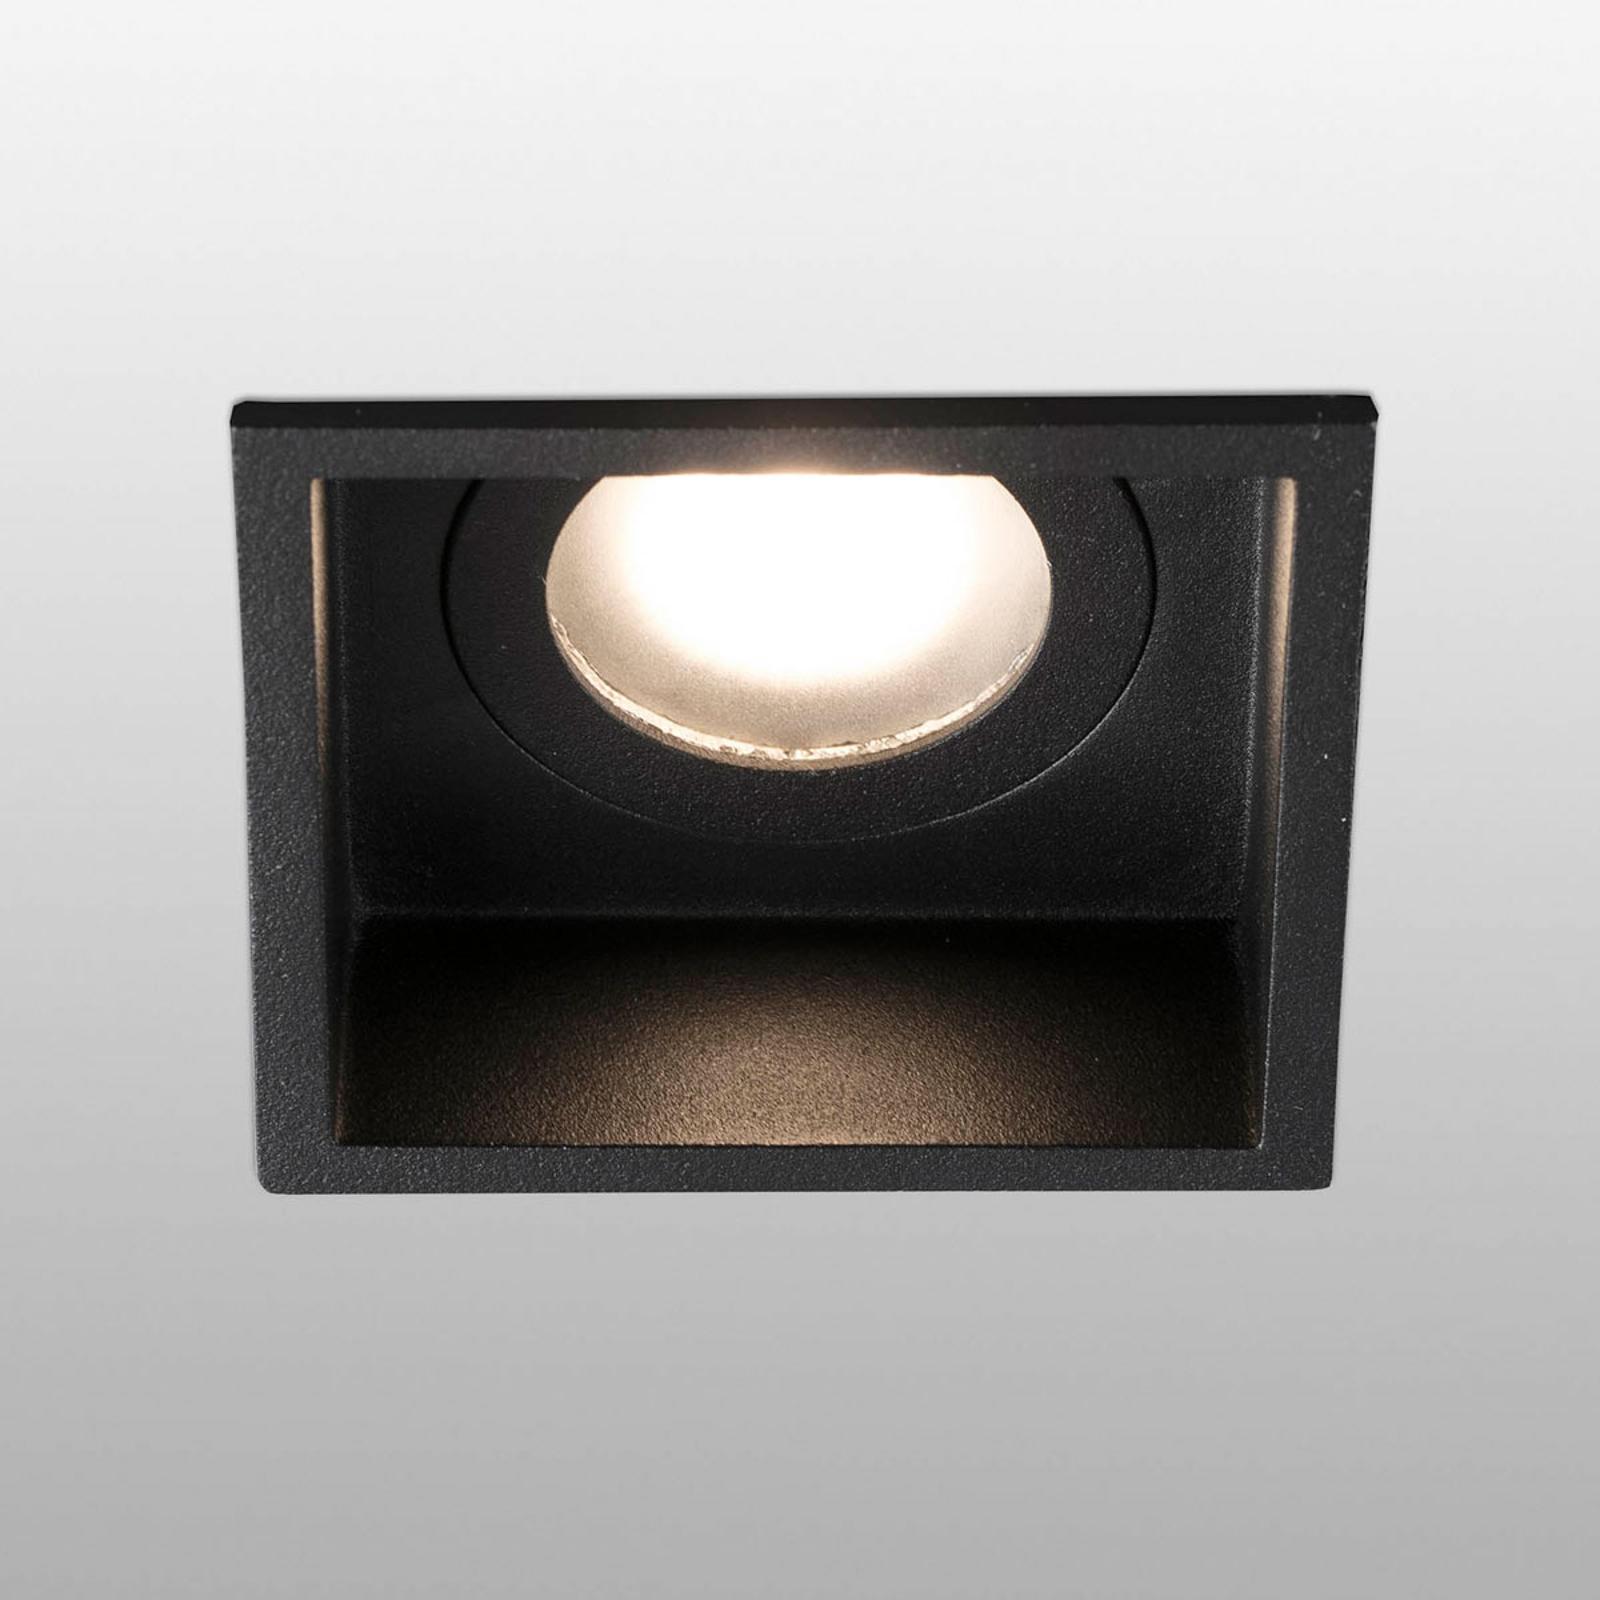 Downlight Hyde 1 lyskilde rammer kantet IP44 svart